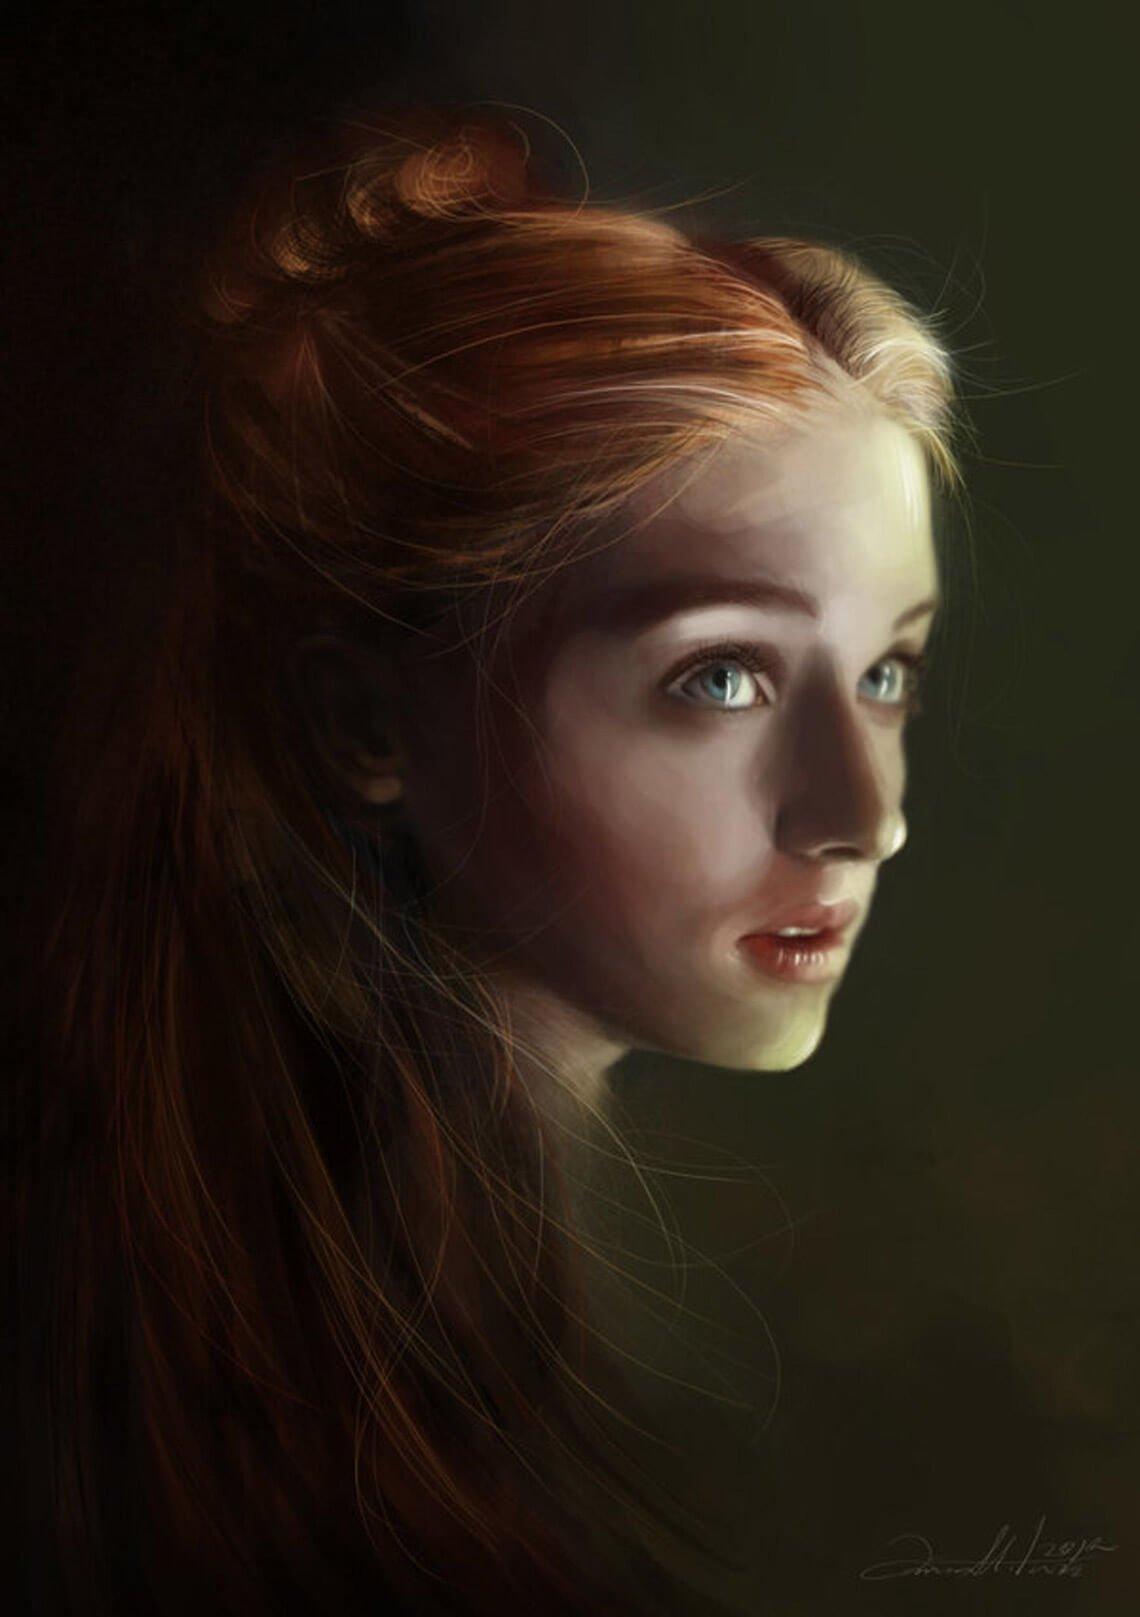 Sansa Stark by Dalisa CG